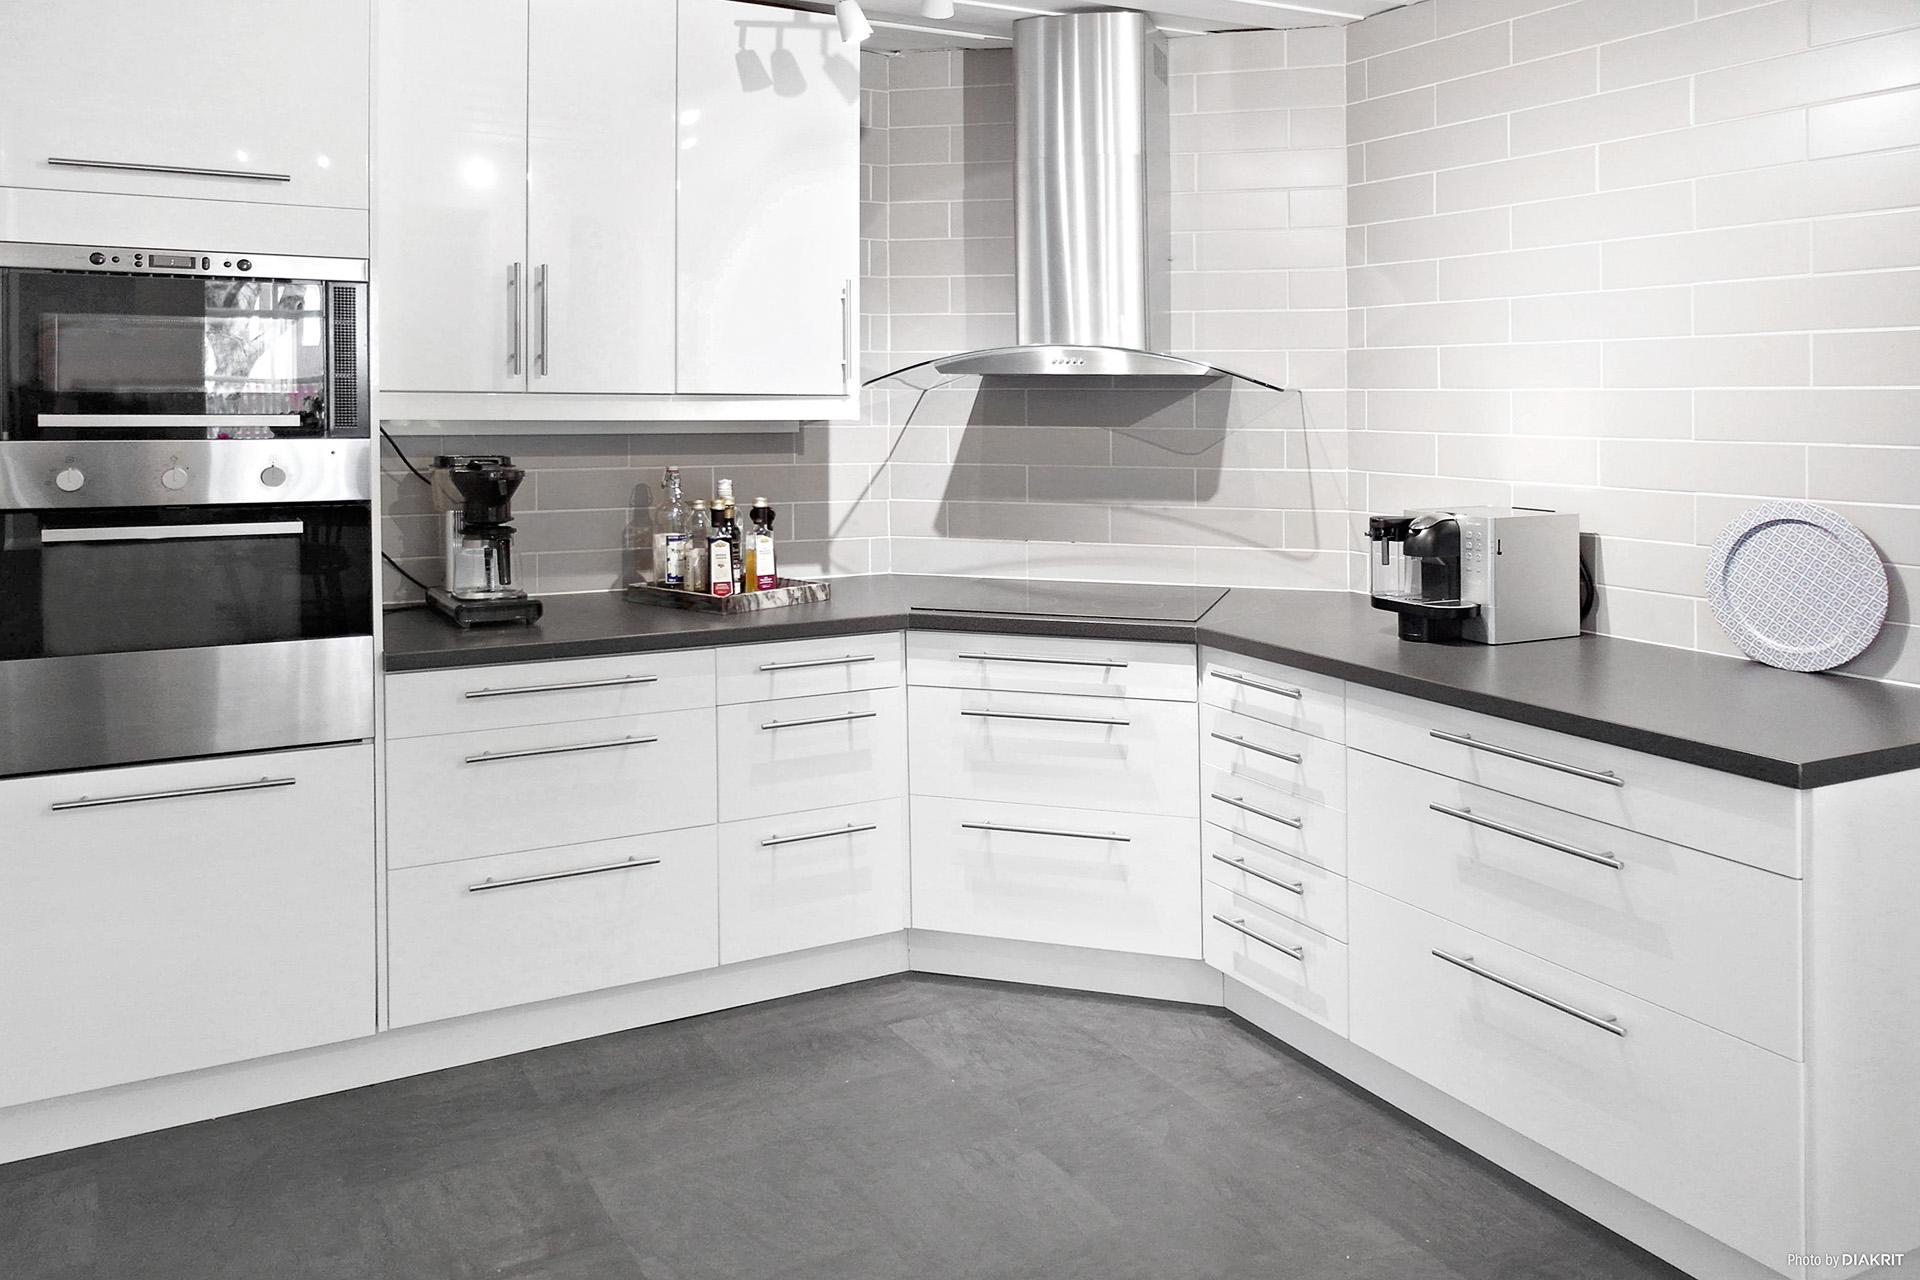 Renoverat kök på entréplan -09.